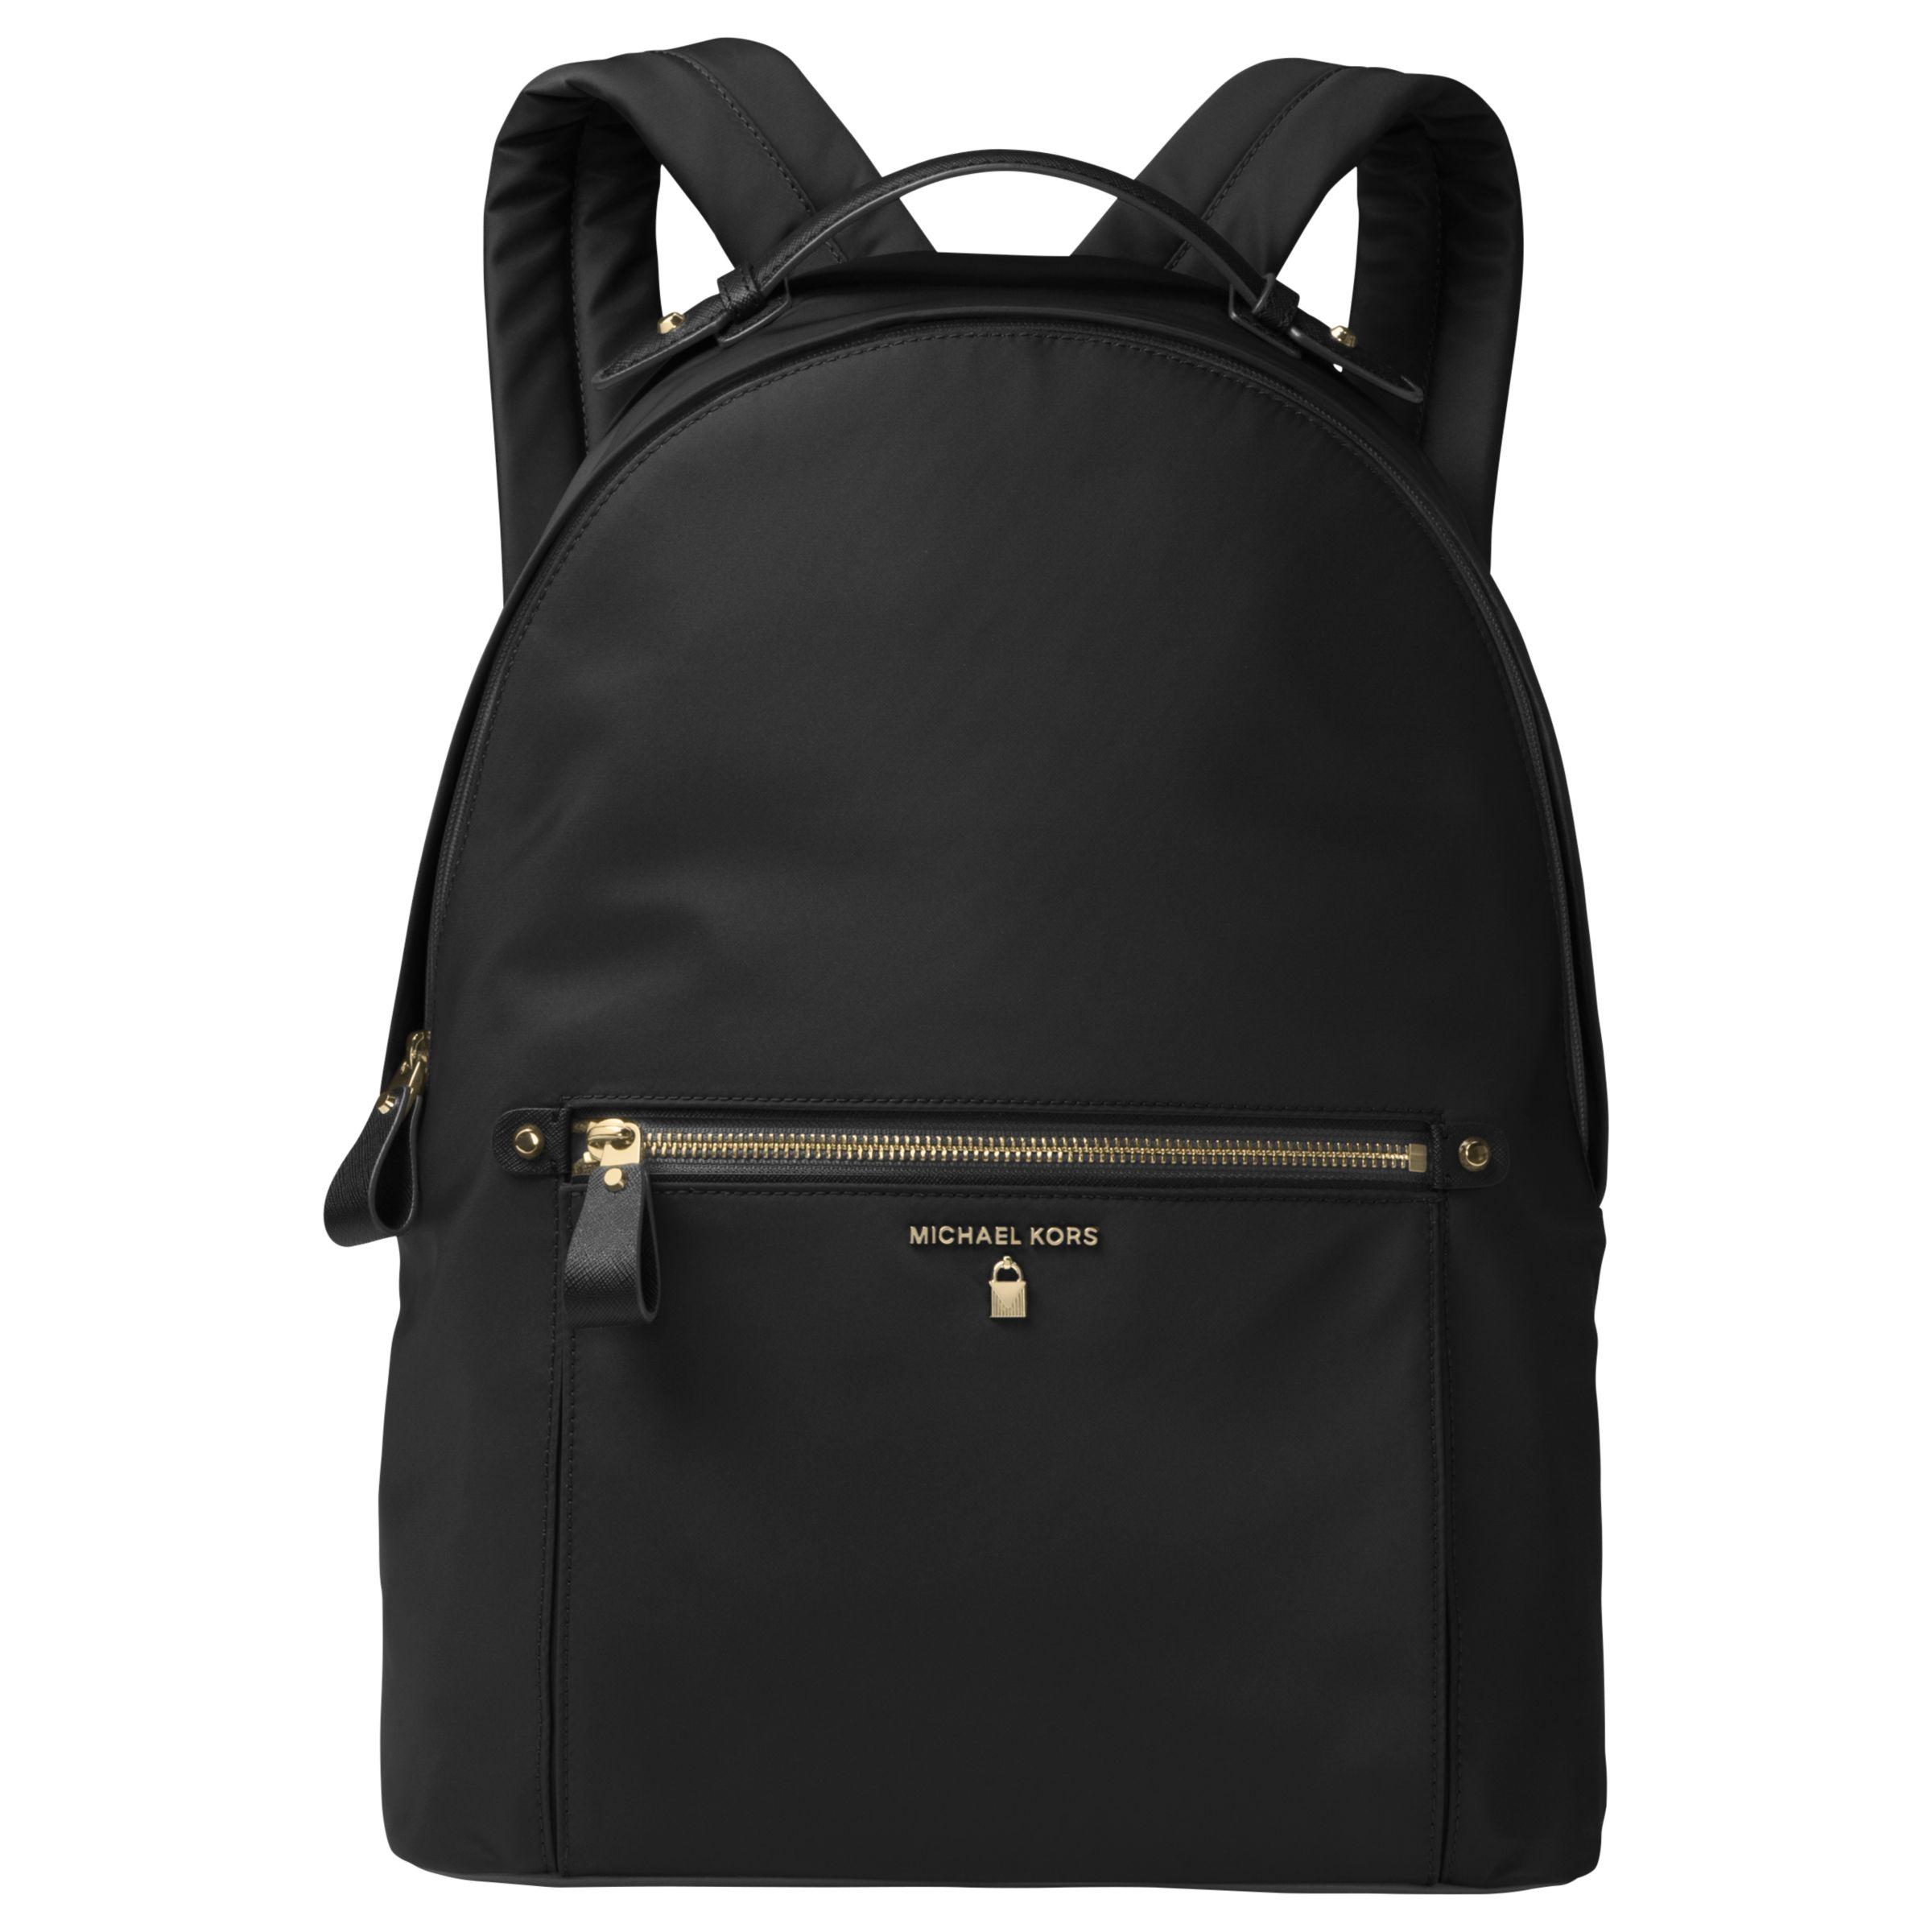 c09f01afbb73 MICHAEL Michael Kors Kelsey Backpack, Black at John Lewis & Partners